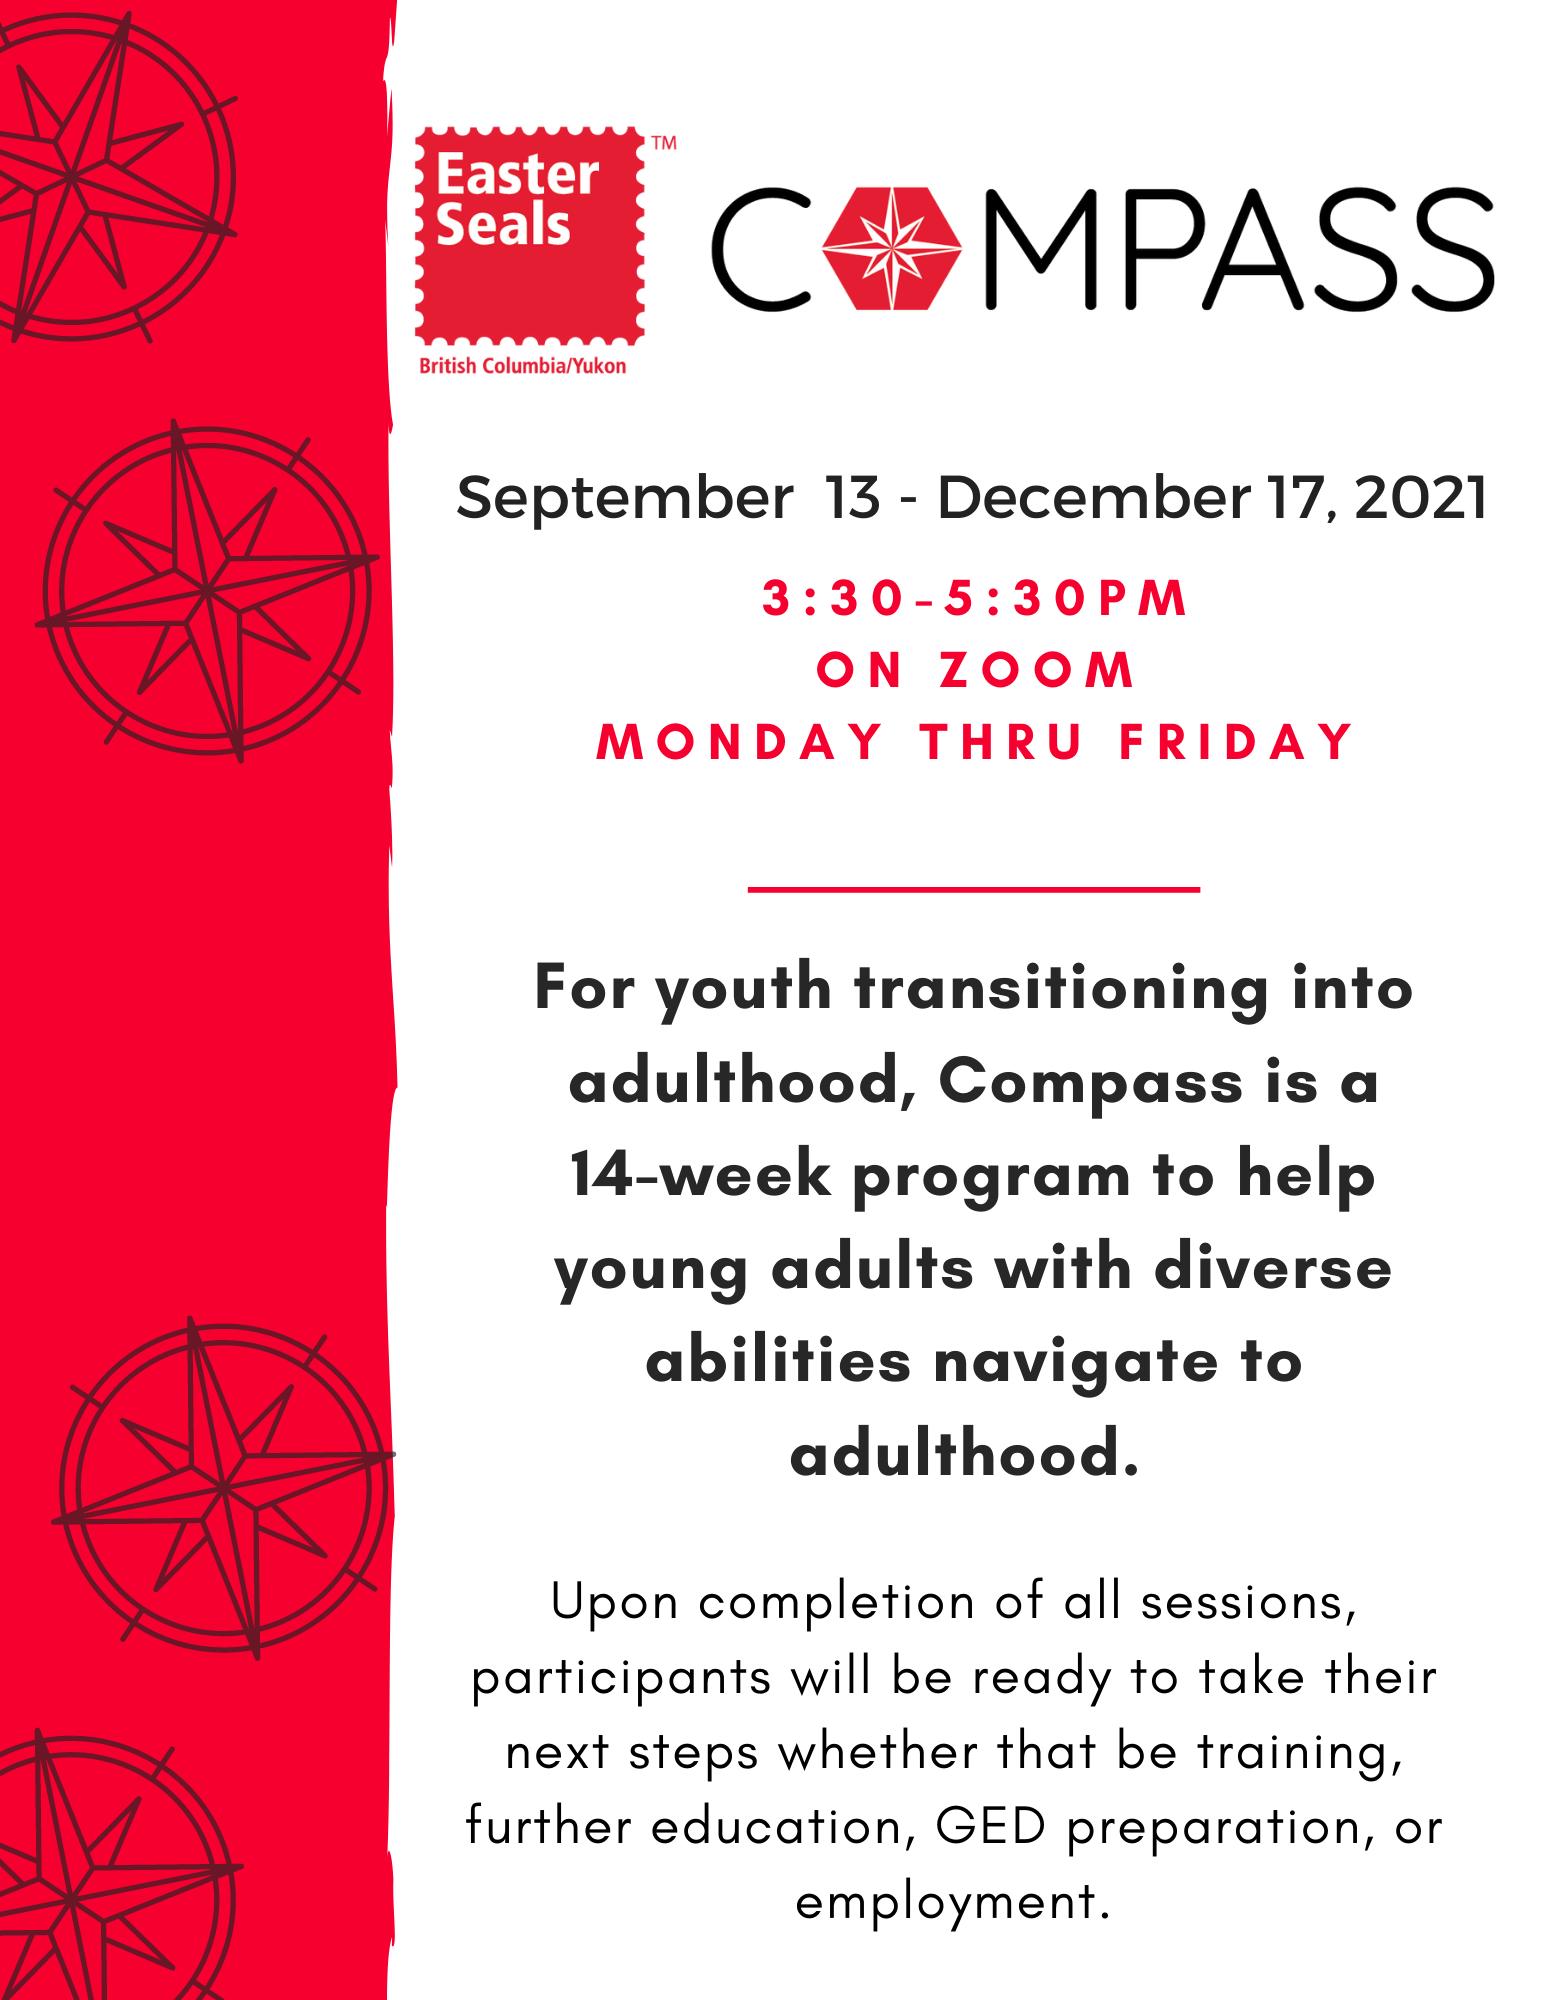 Easter Seals Compass Program - Navigating to Adulthood